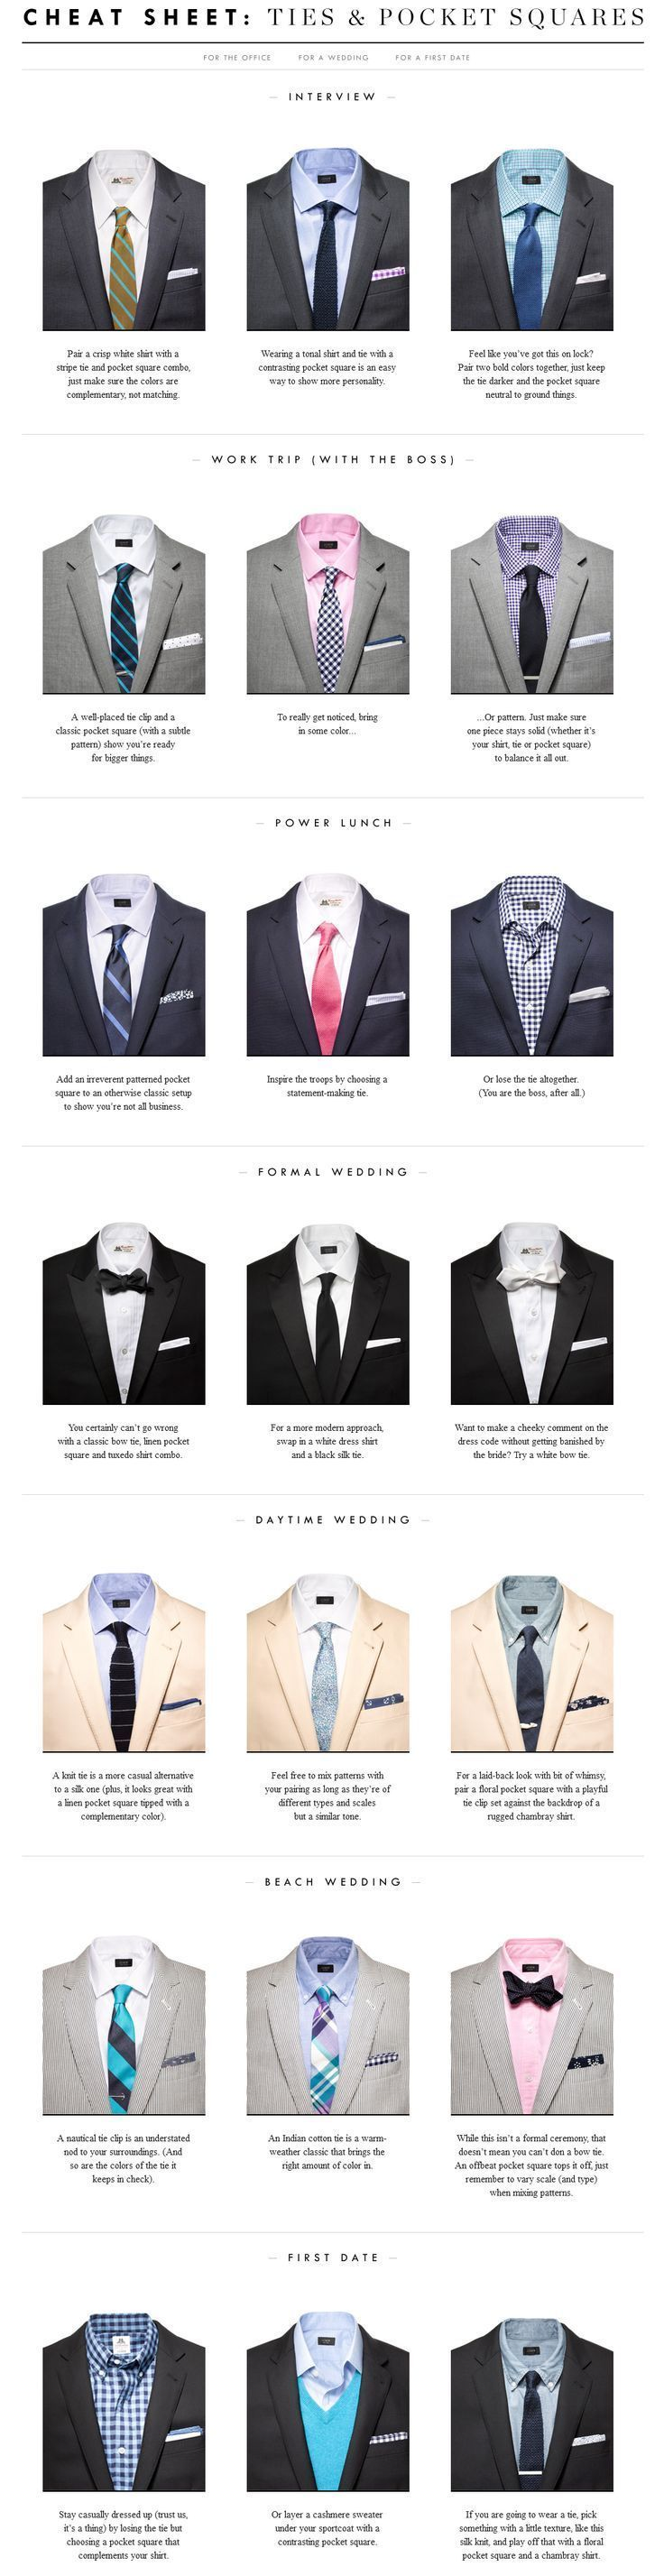 Mens fashion dress shirts Tie & Pocket Square Cheat Sheet // lifted from @J.Crew's website #MensFashionNightOut